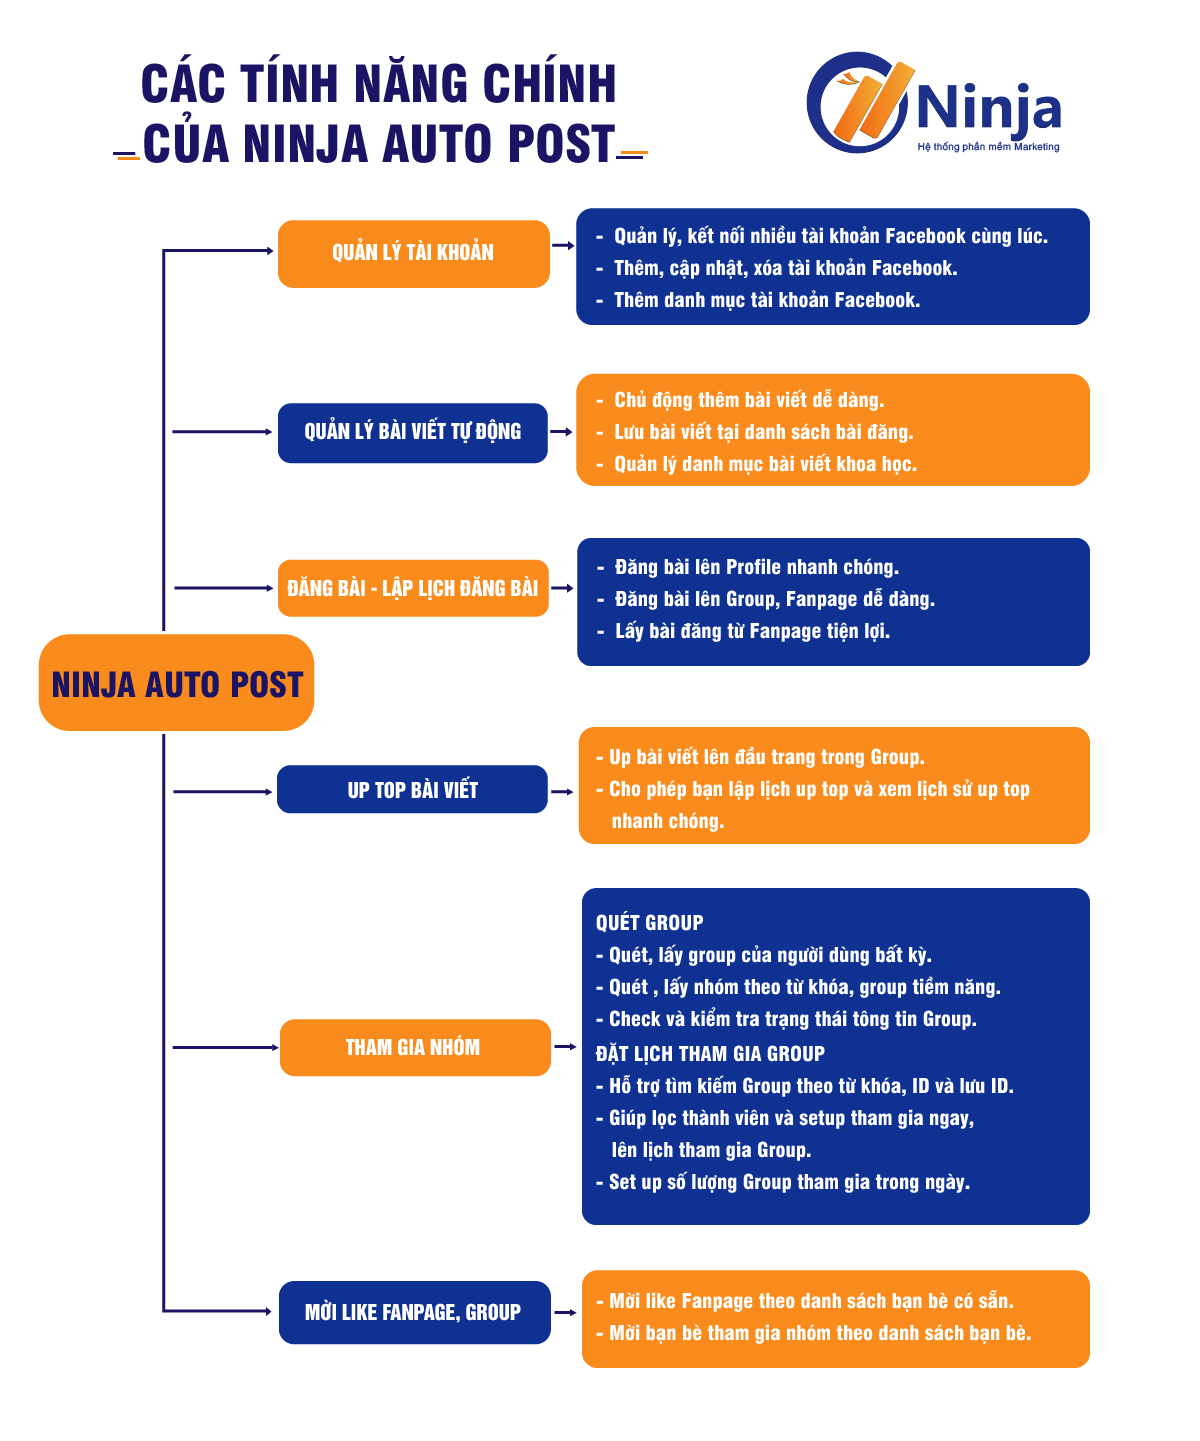 ninja-auto-post-phan-mem-dang-tin-quang-cao-tu-dong